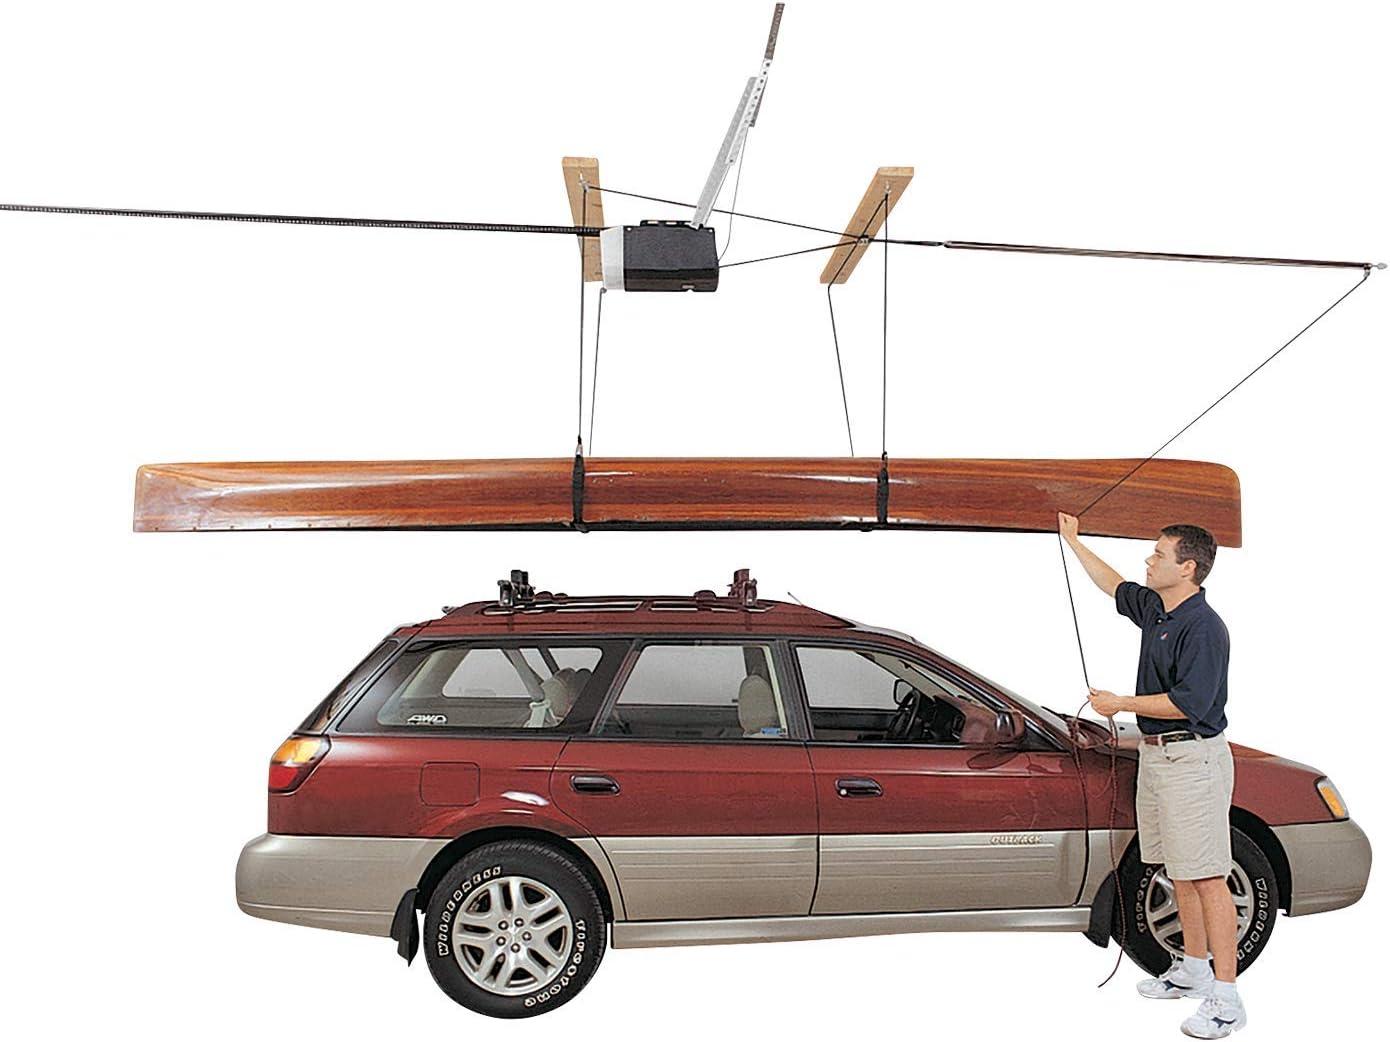 4 Point System Part No 7808 2:1 Mechanical Advantage HARKEN Garage Storage Ceiling Hoist for 10ft Ceilings up to 45lbs//20kg Max Load